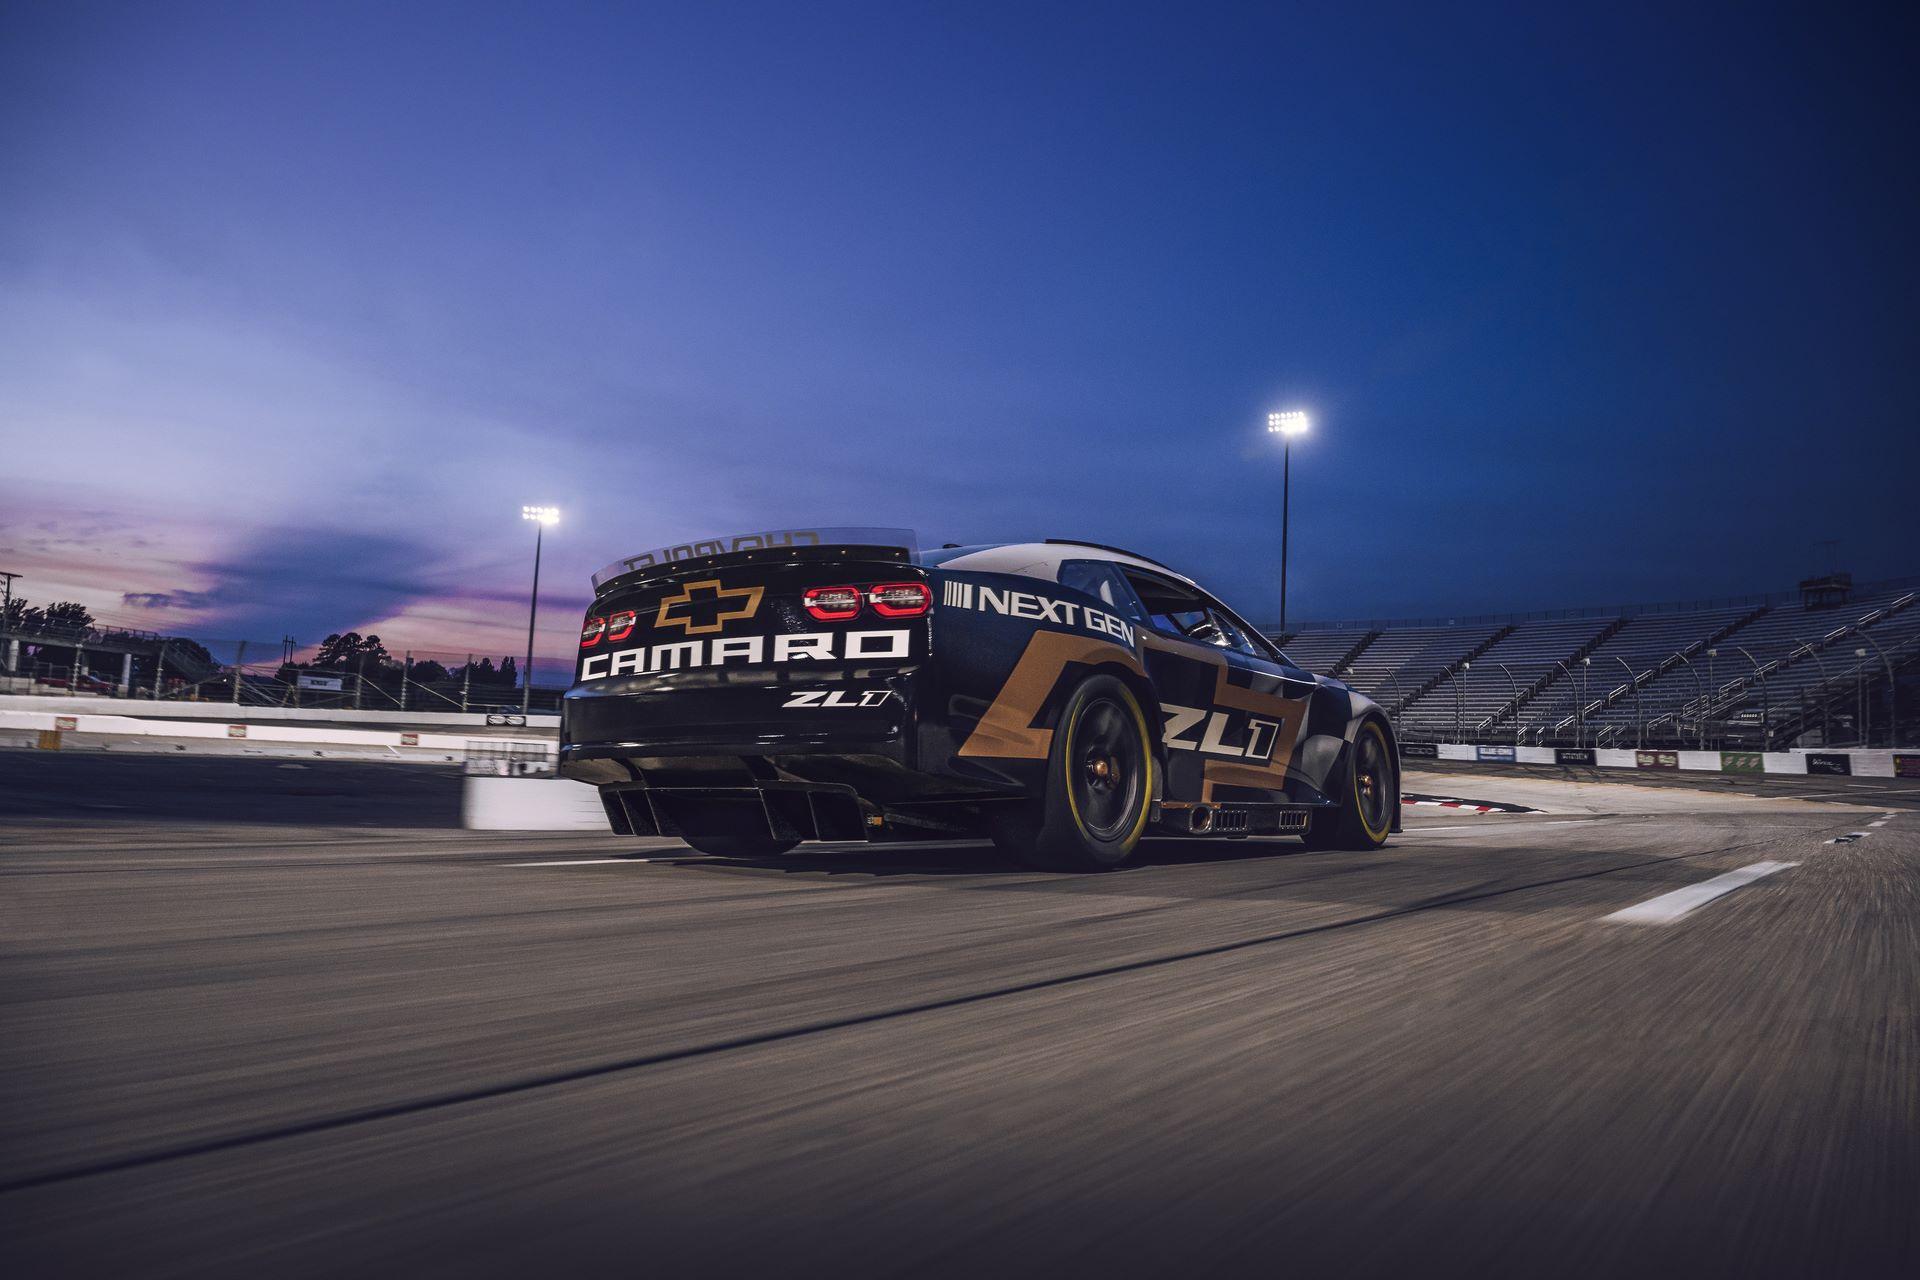 Chevrolet-Camaro-ZL1-RaceCarr-Next-Gen-Nascar-4